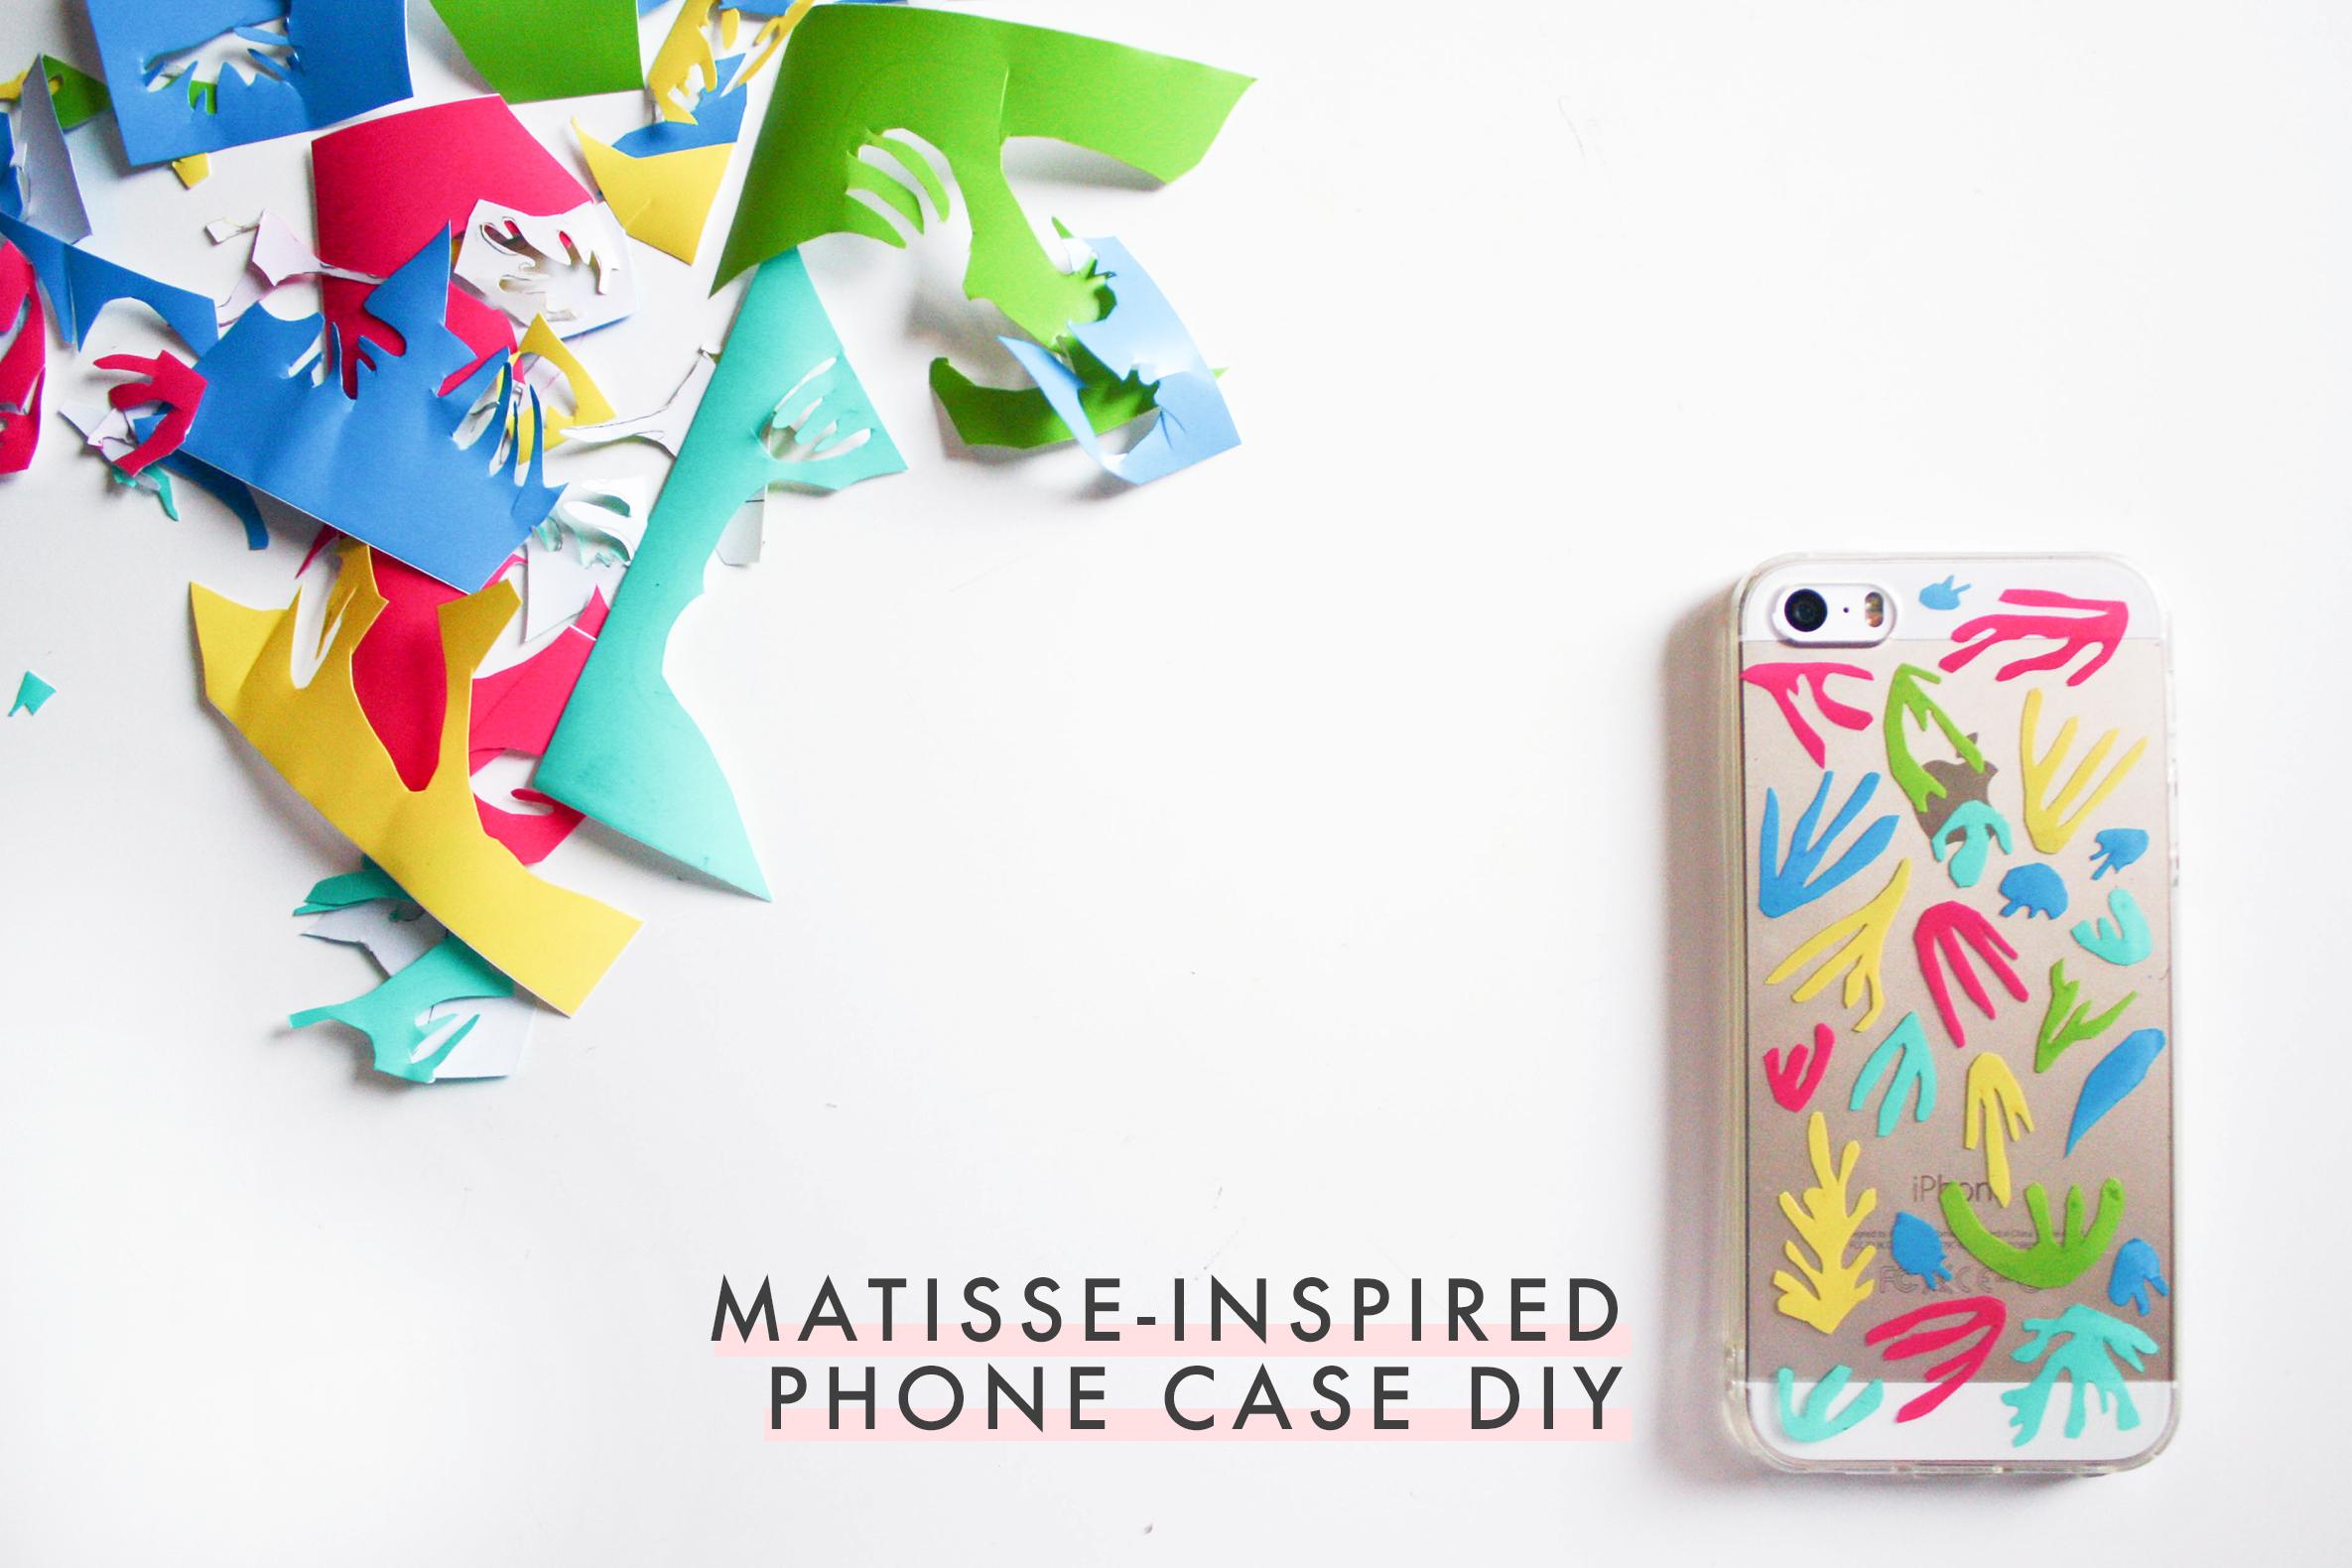 matisse-inspired phone case diy